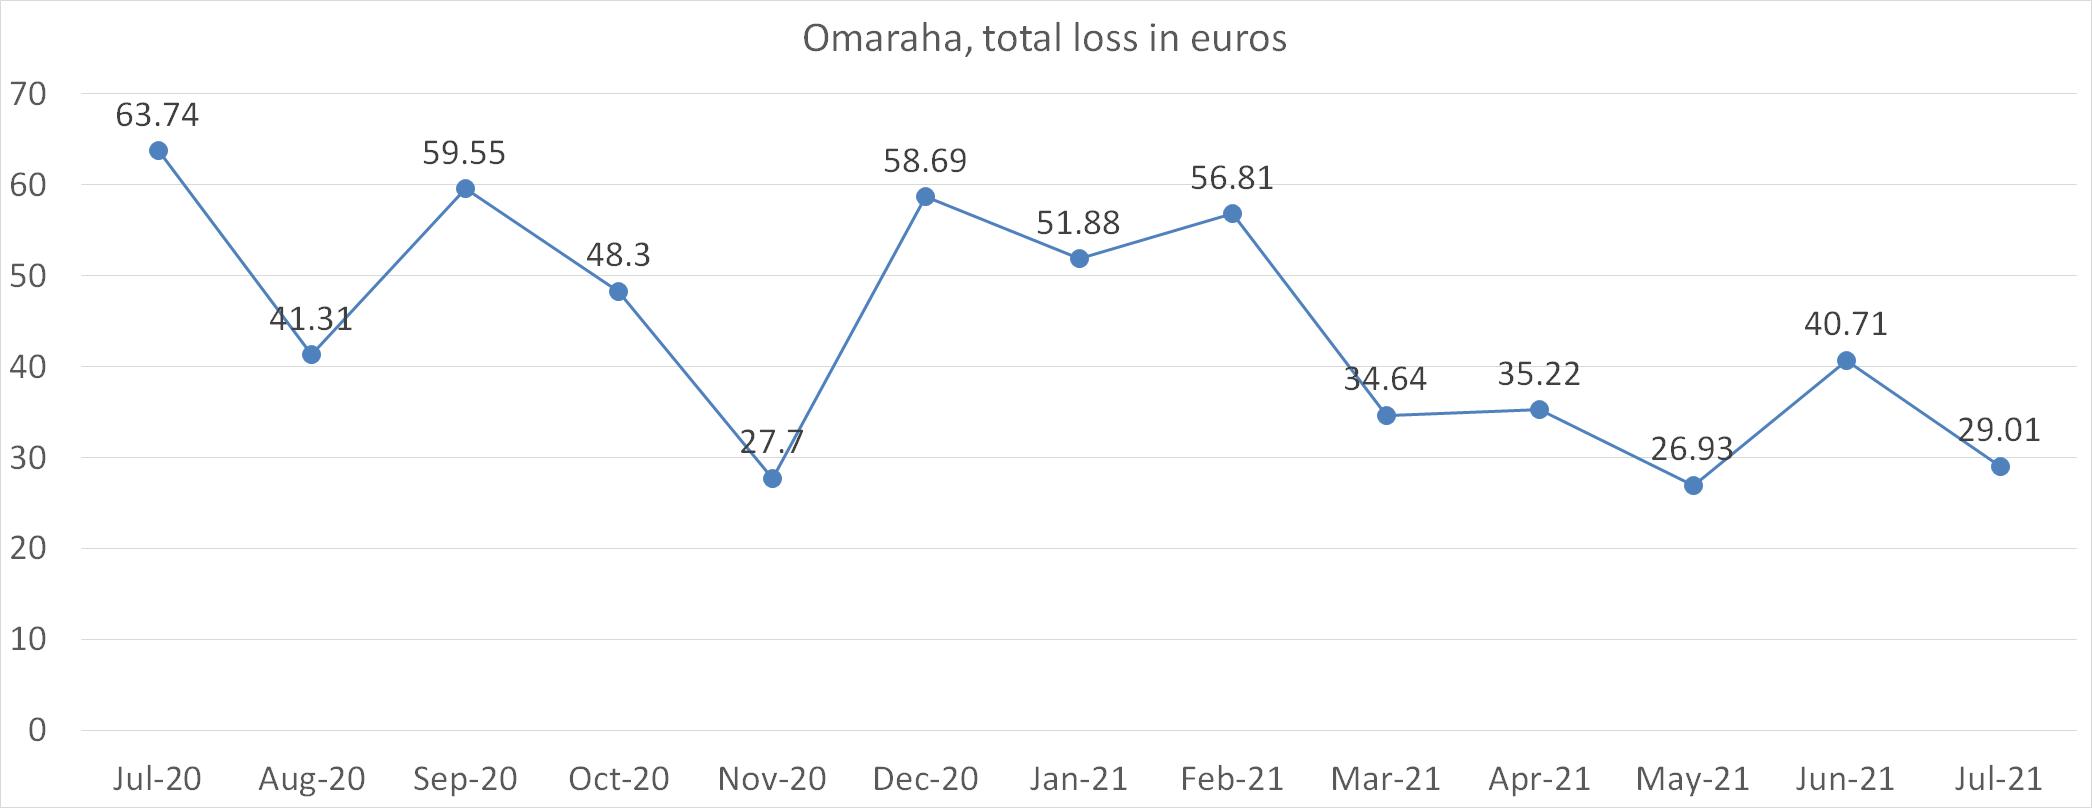 Omaraha, total loss in euros july 2021